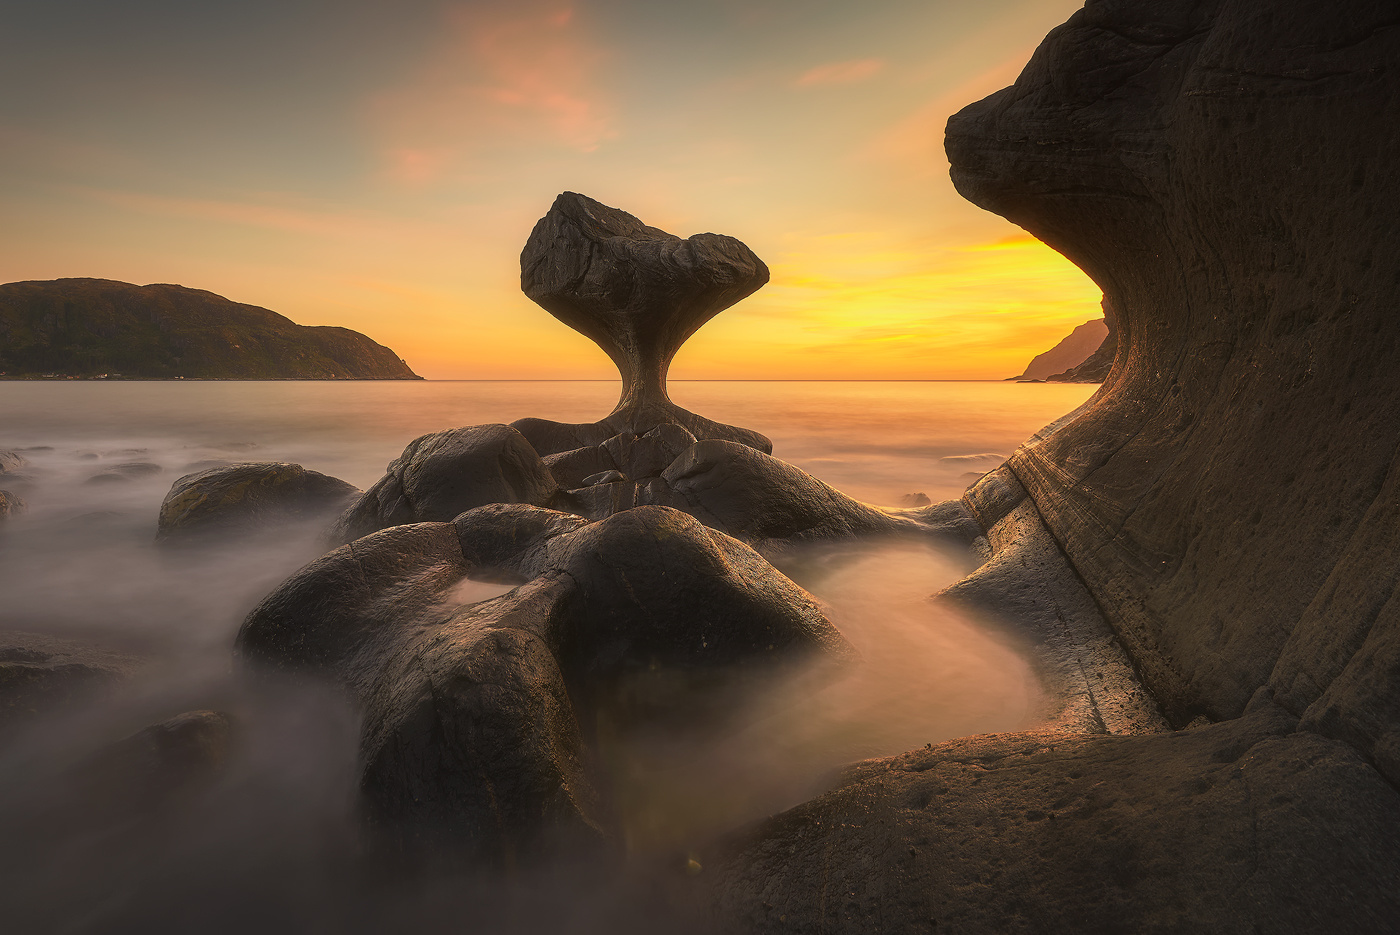 Kannesteinen by Rafal Kani